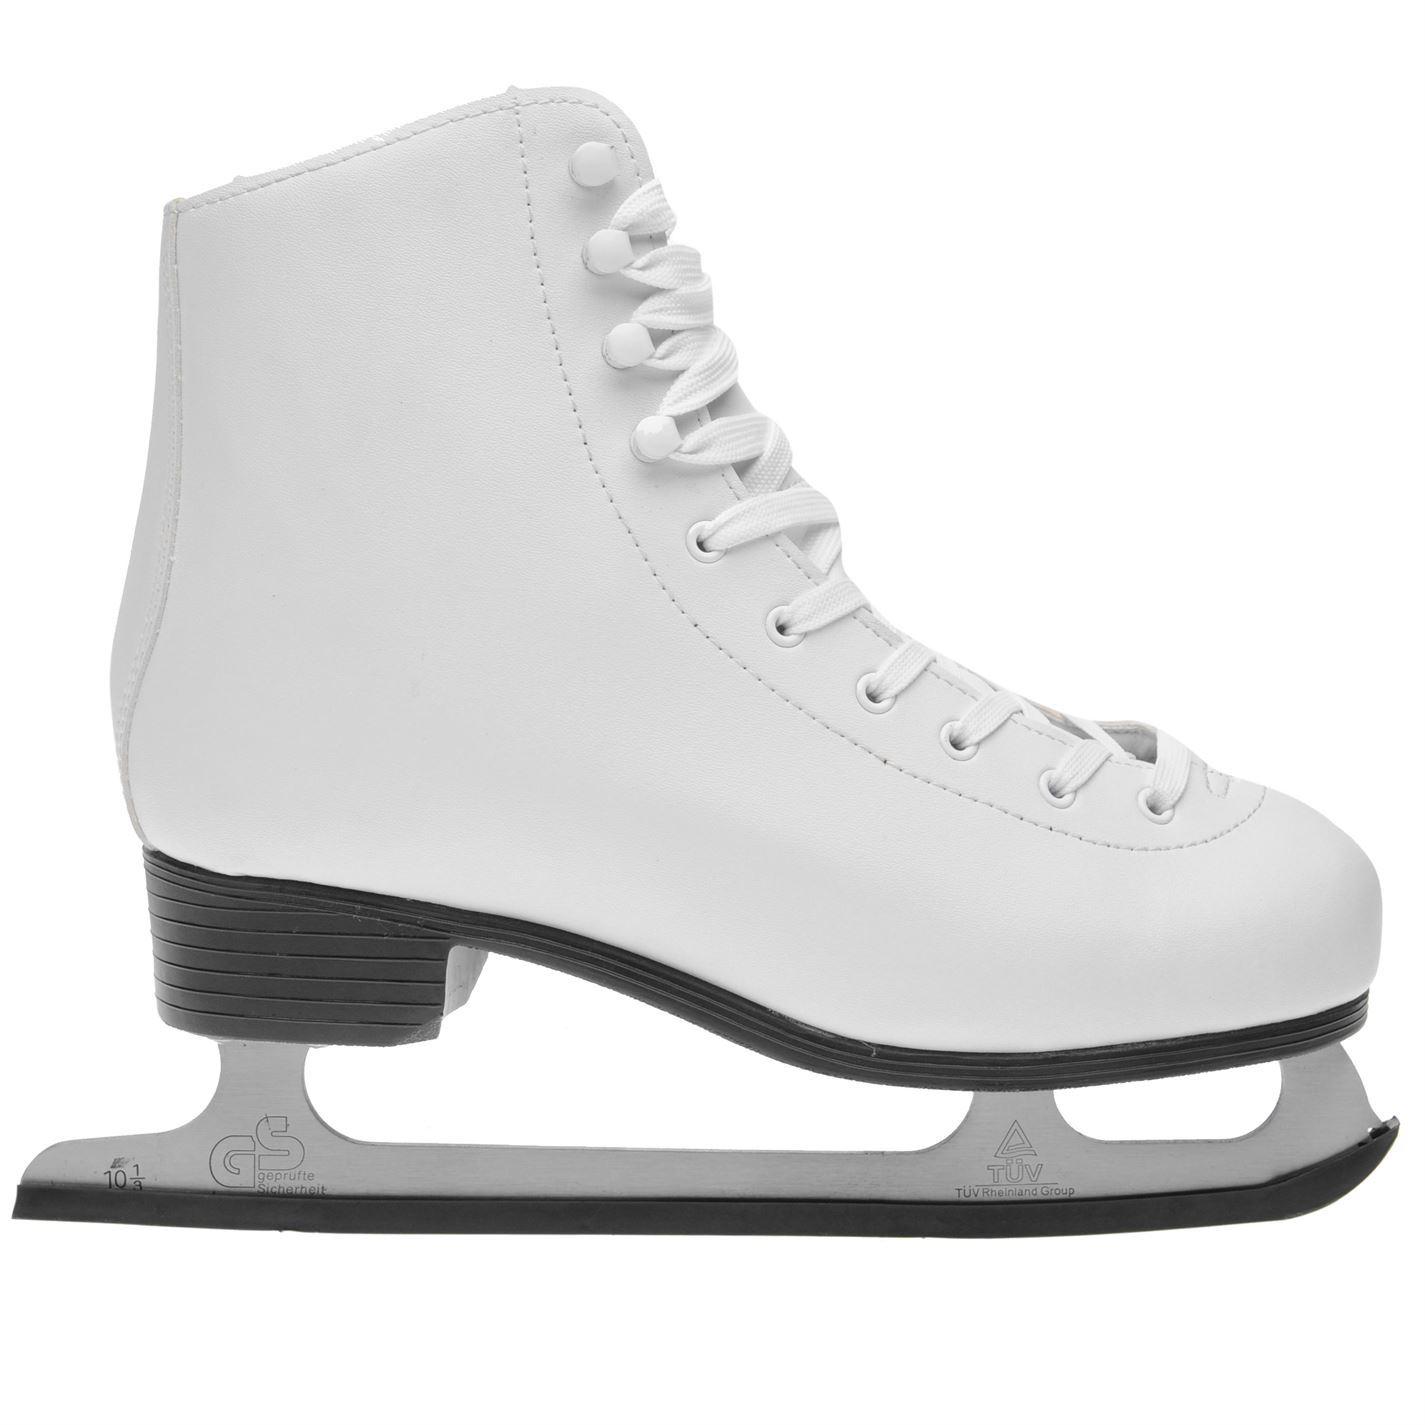 2efc8e8675f Nevica Womens Ladies Figure Skates Classic Ice Leather Upper